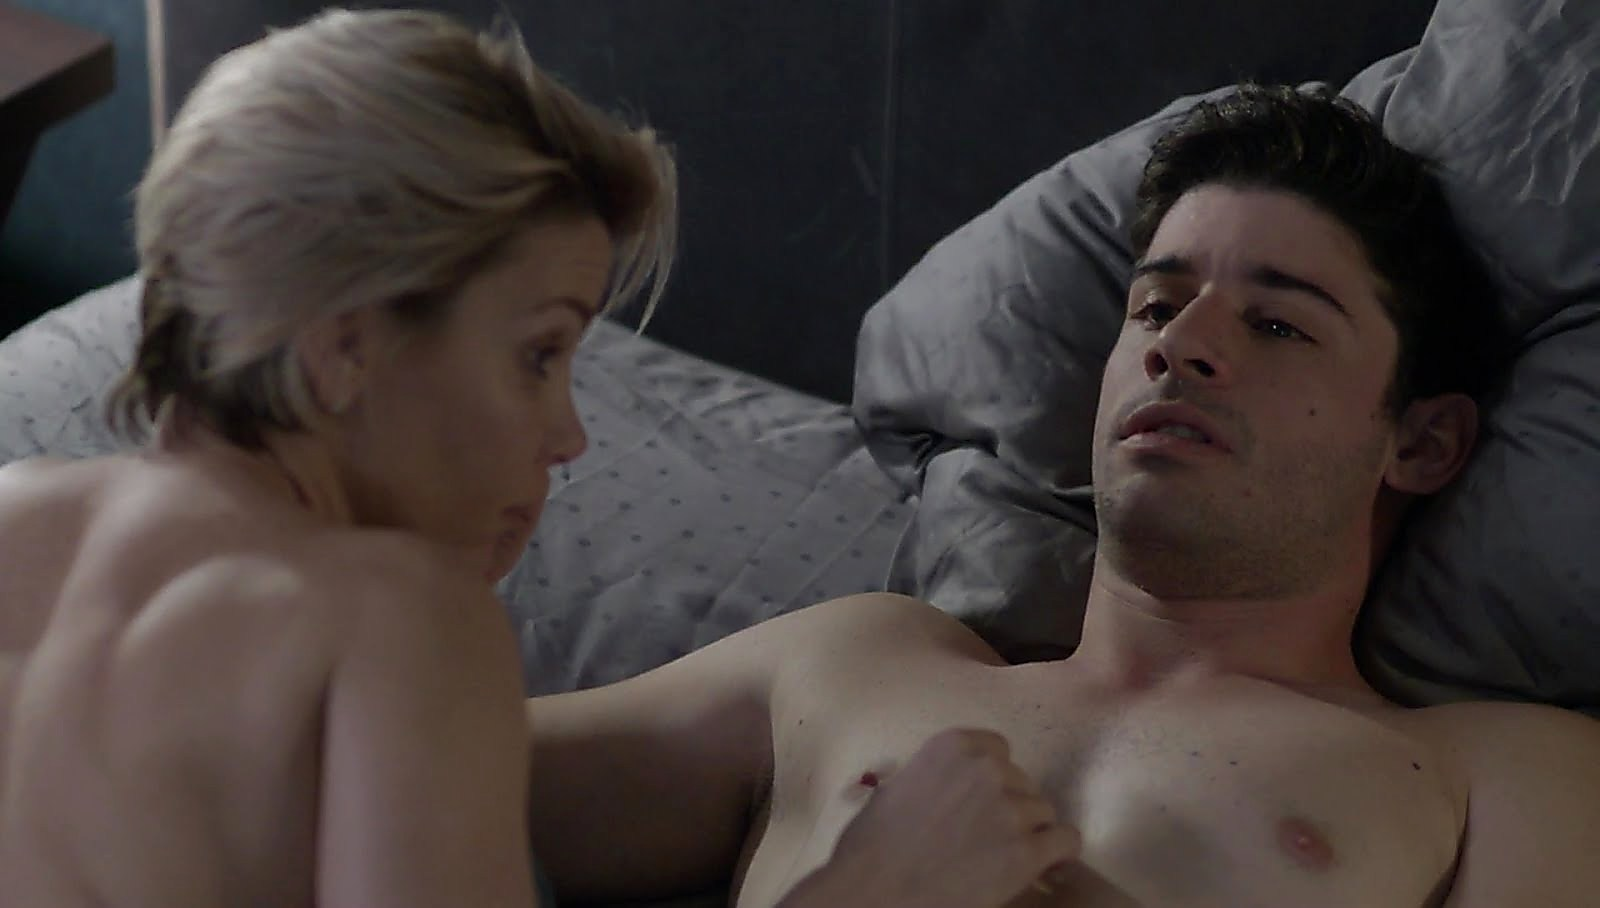 Jonathan Freudman sexy shirtless scene June 12, 2018, 1am